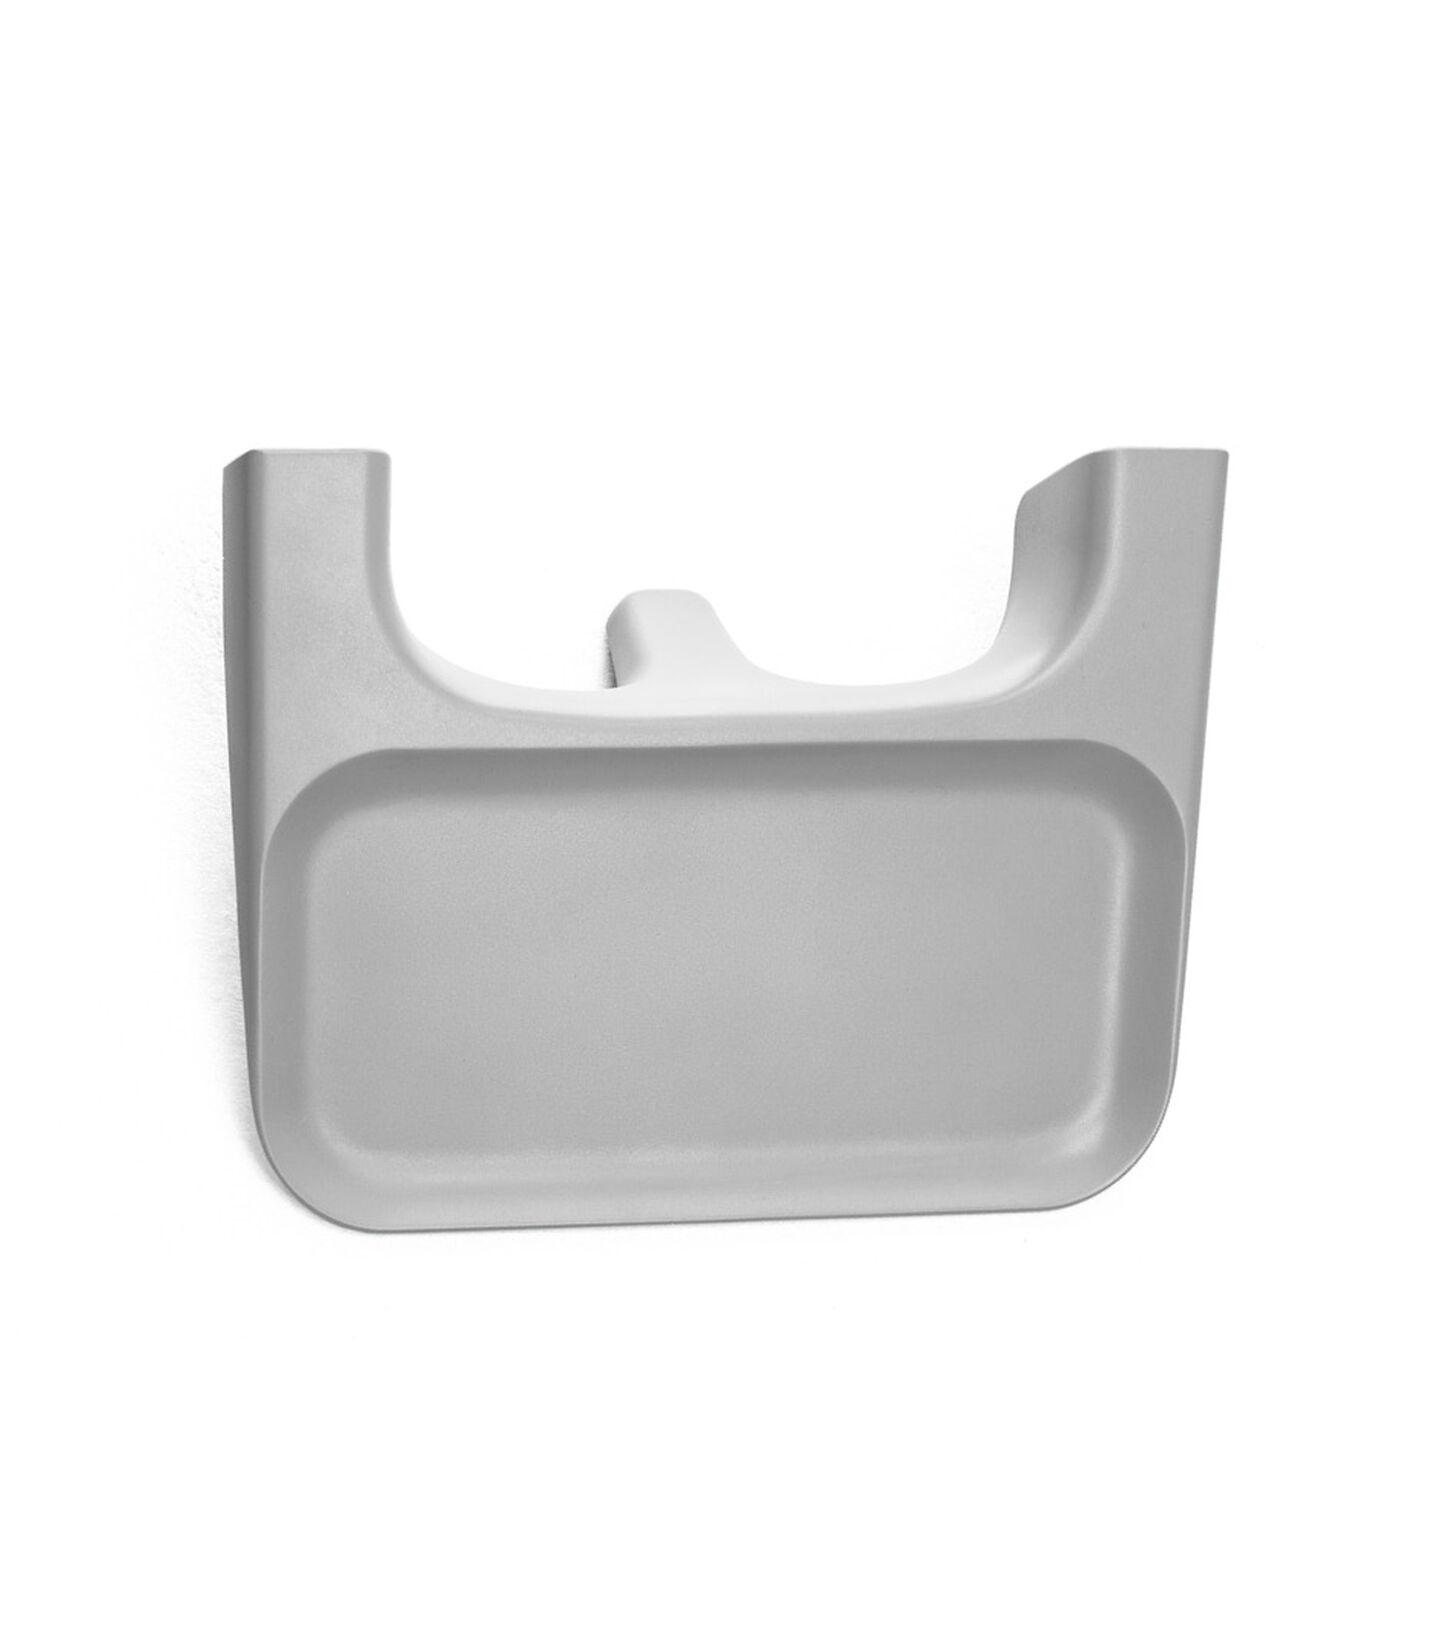 Stokke® Clikk™ Tray Cloud Grey, Cloud Grey, mainview view 2